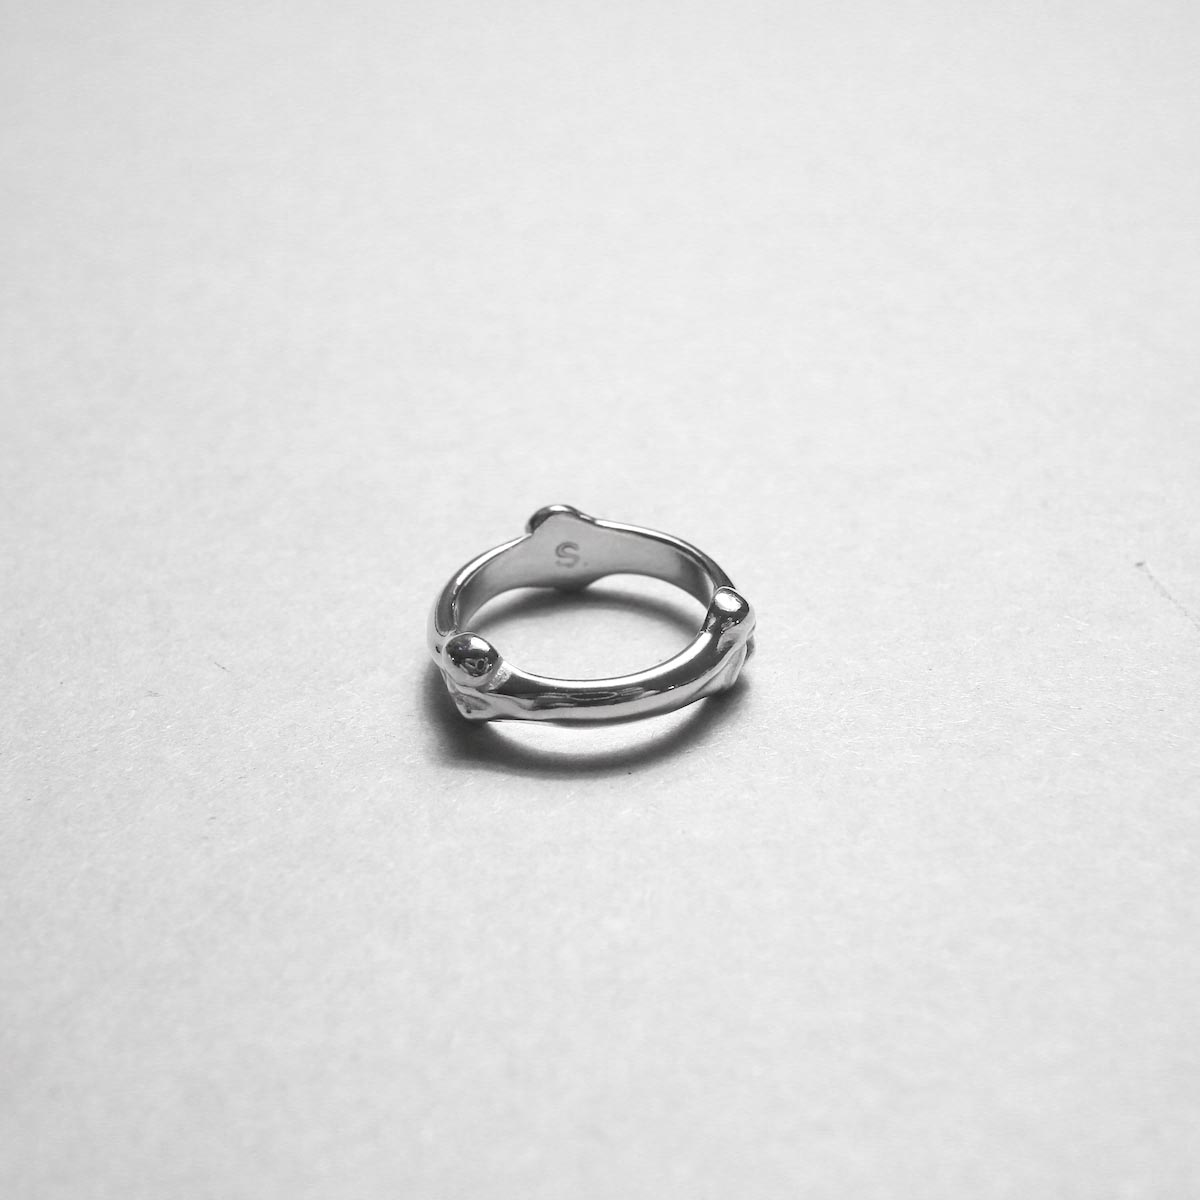 The Soloist / sa.0029AW20 bone shaped band ring.